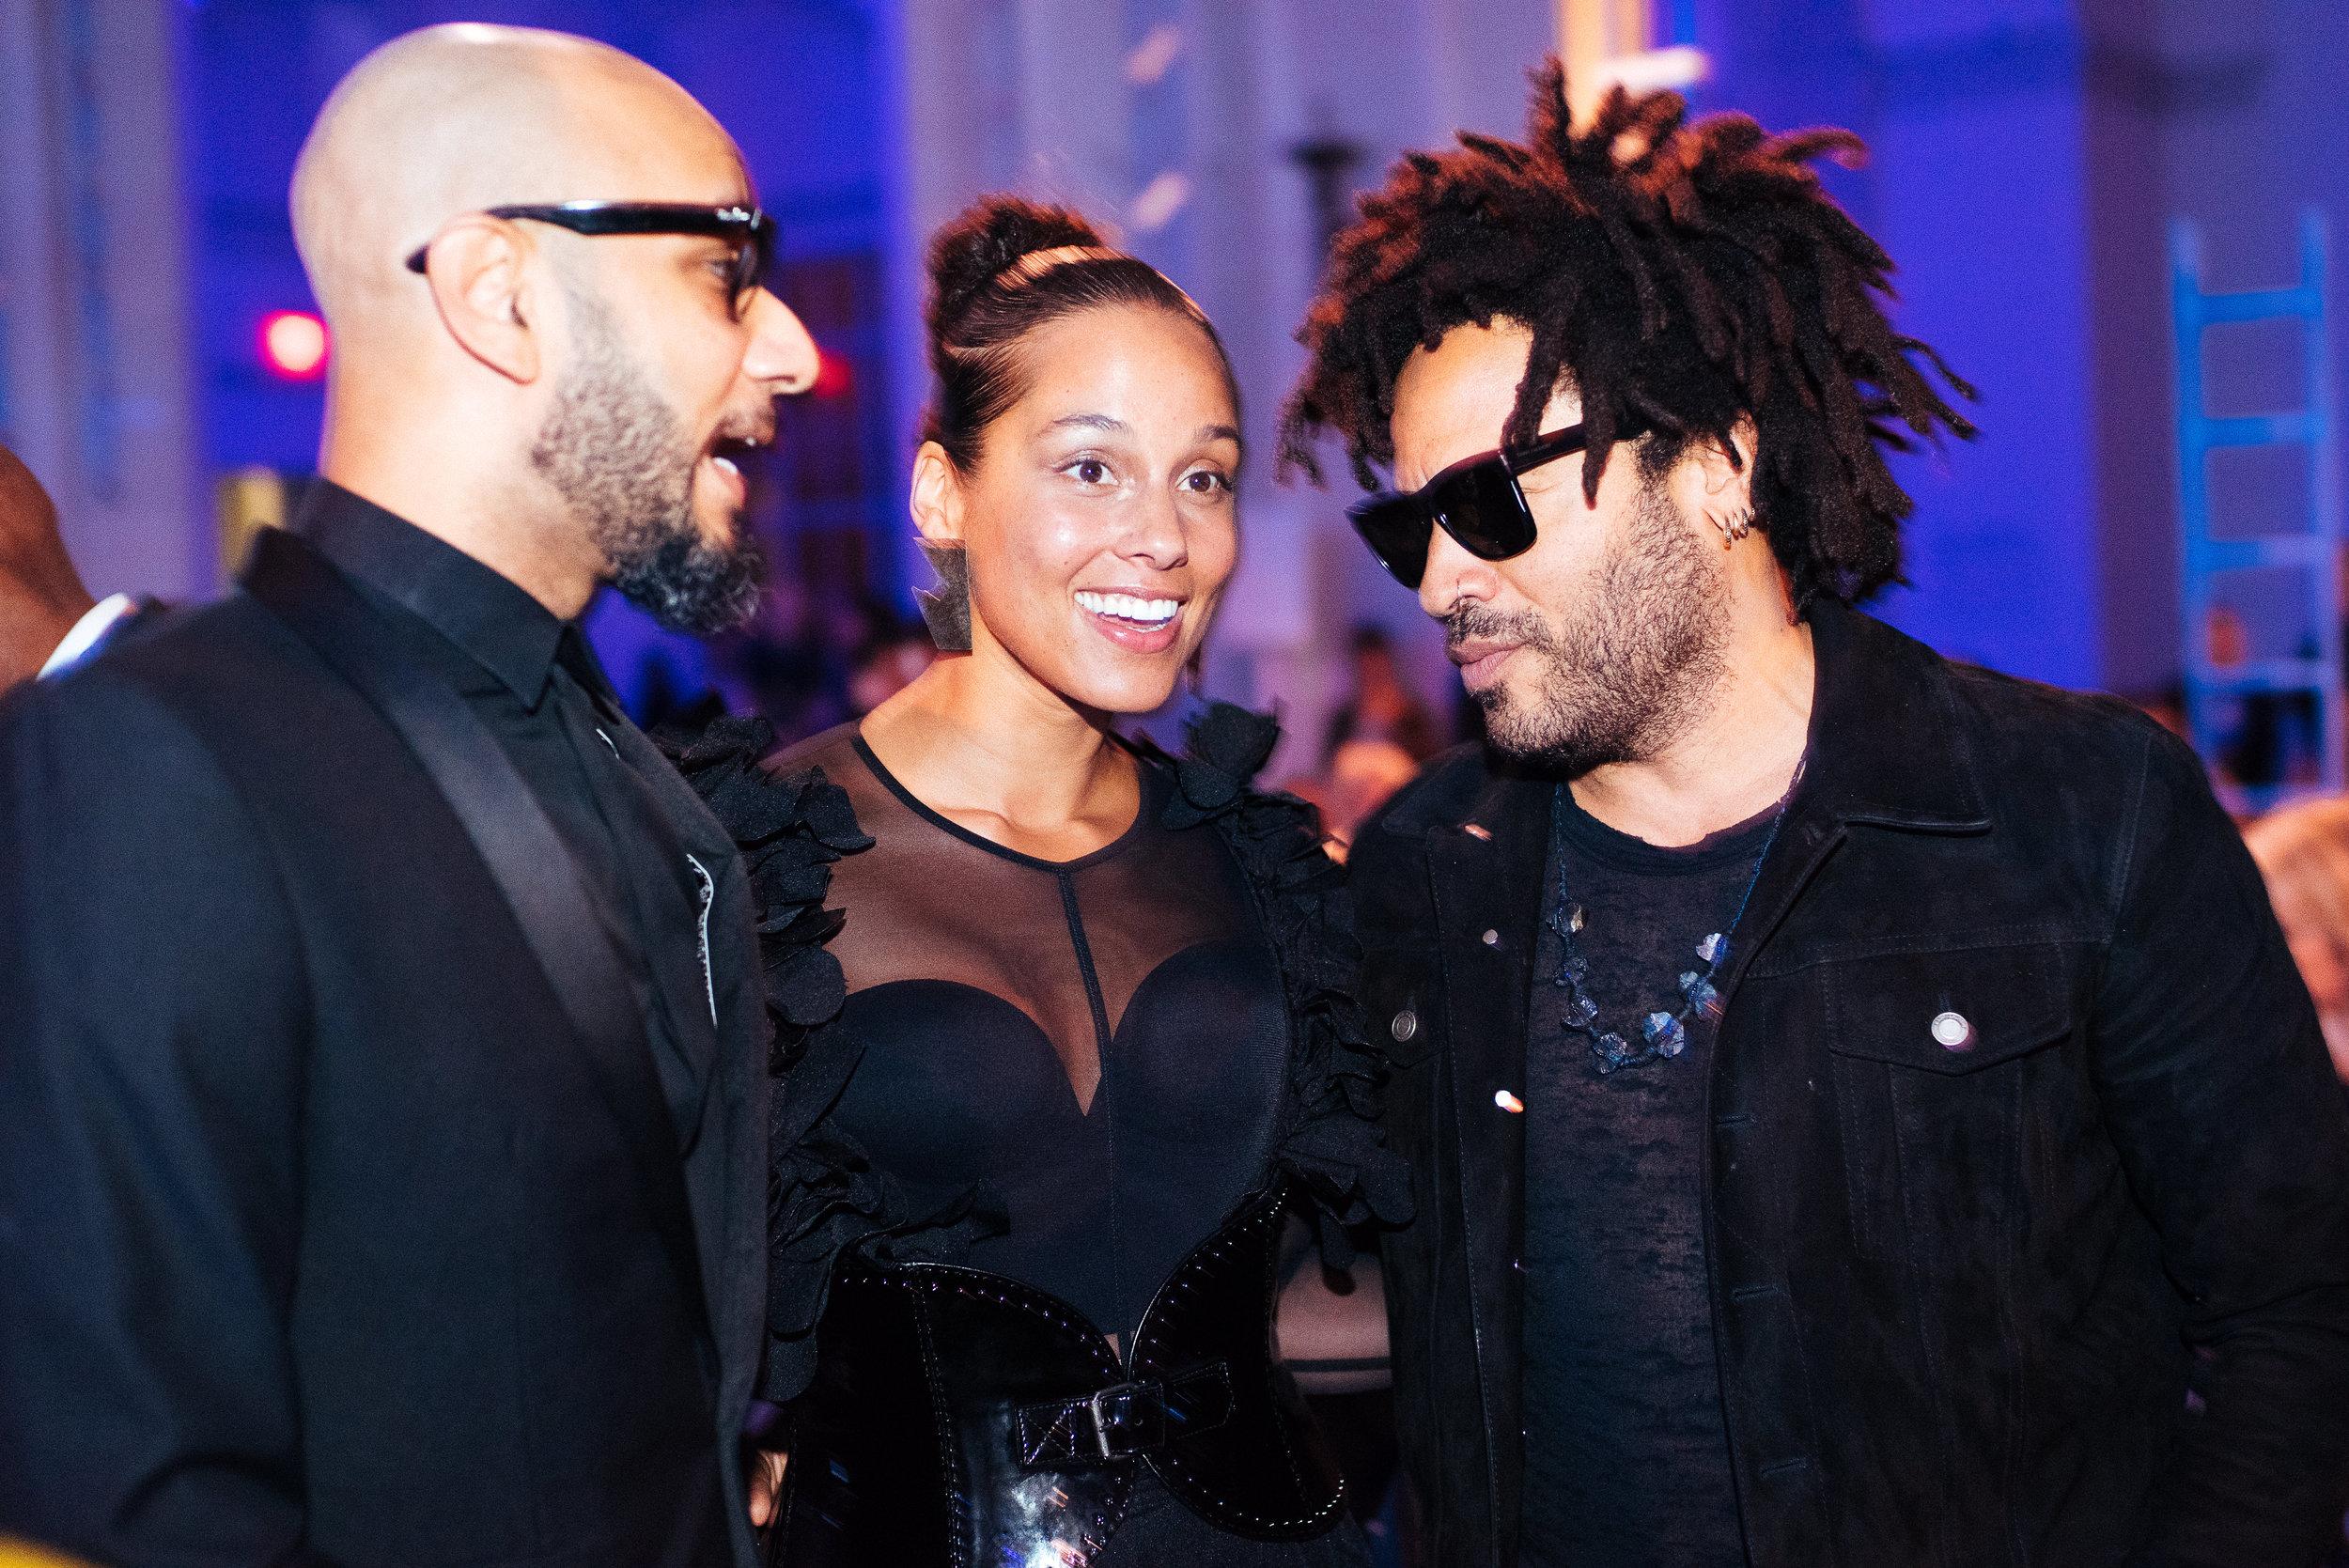 The Brooklyn Artists Ball at Brooklyn Museum 2017. Swizz Beats, Alicia Keys and Lenny Kravitz